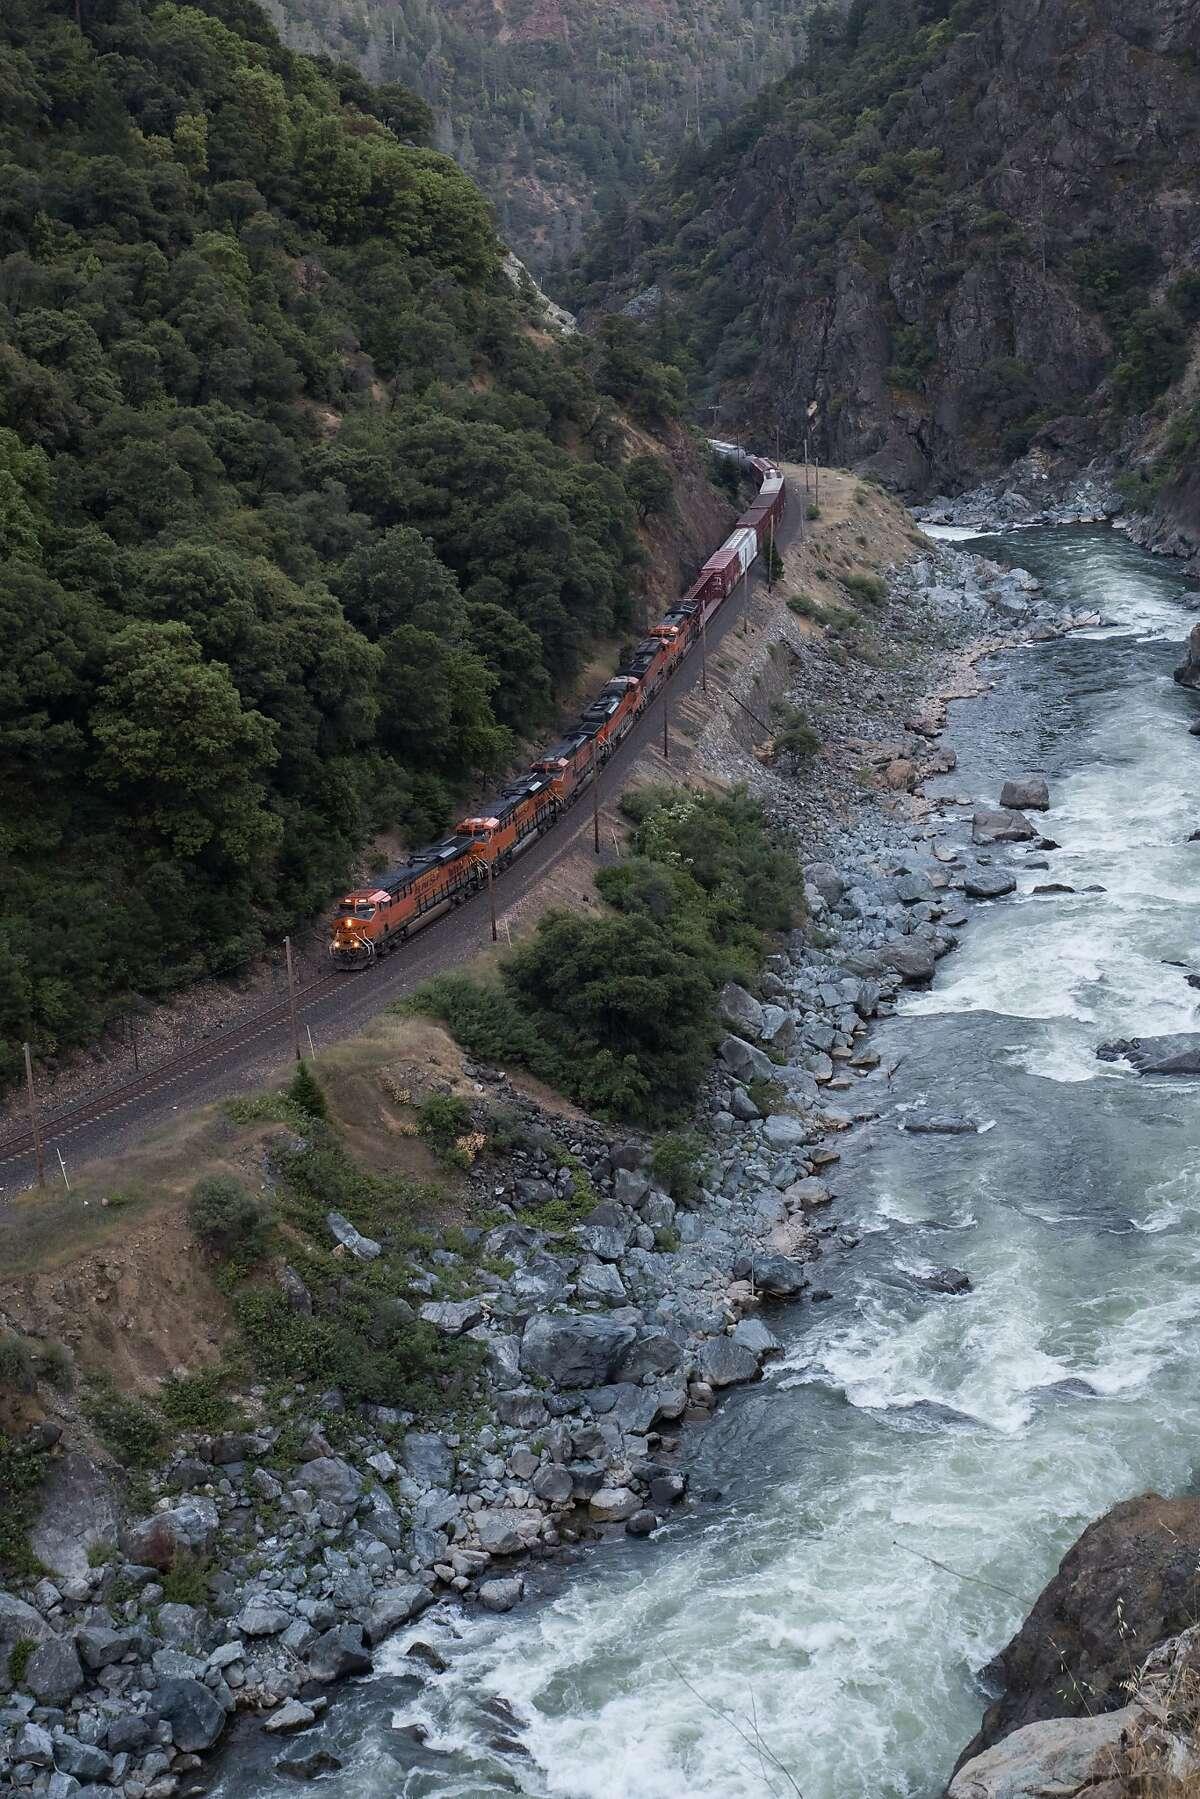 Freight train heading toward Pulga Bridge along Feather River and SR 70 at Pulga Road on Sunday, May 28 2017 in Plumas County, CA.